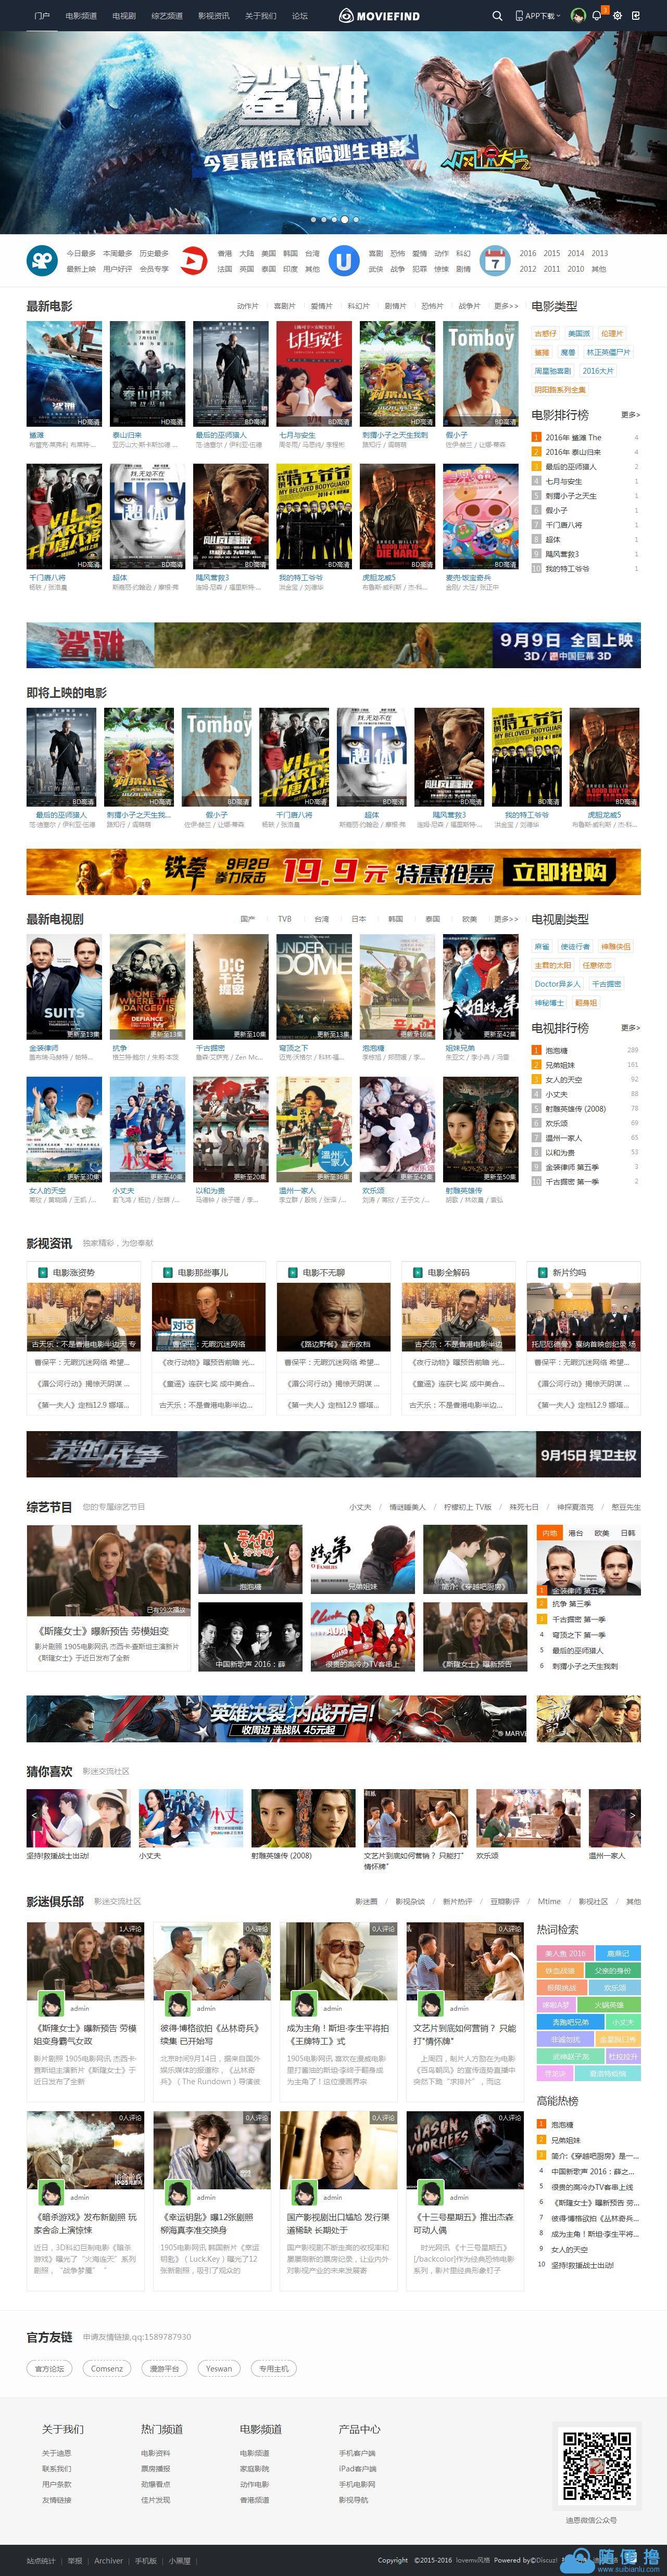 Discuz x3.4模板 迪恩电影电视剧视频 商业版 GBK DZ影视网站模板